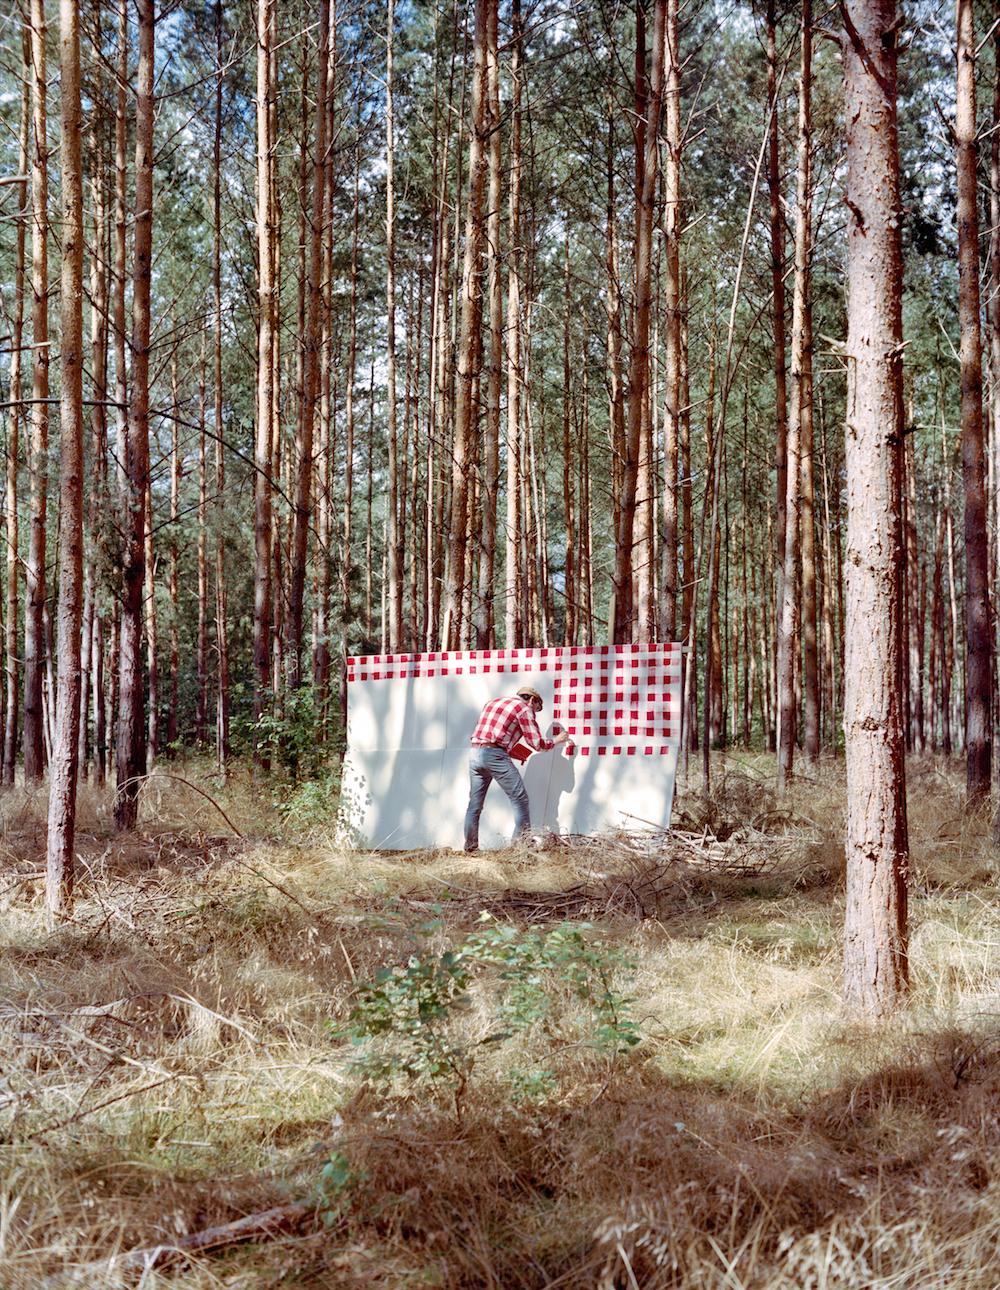 Шутливый проект от Хэнка Шмидта и Фабиана Шуберта